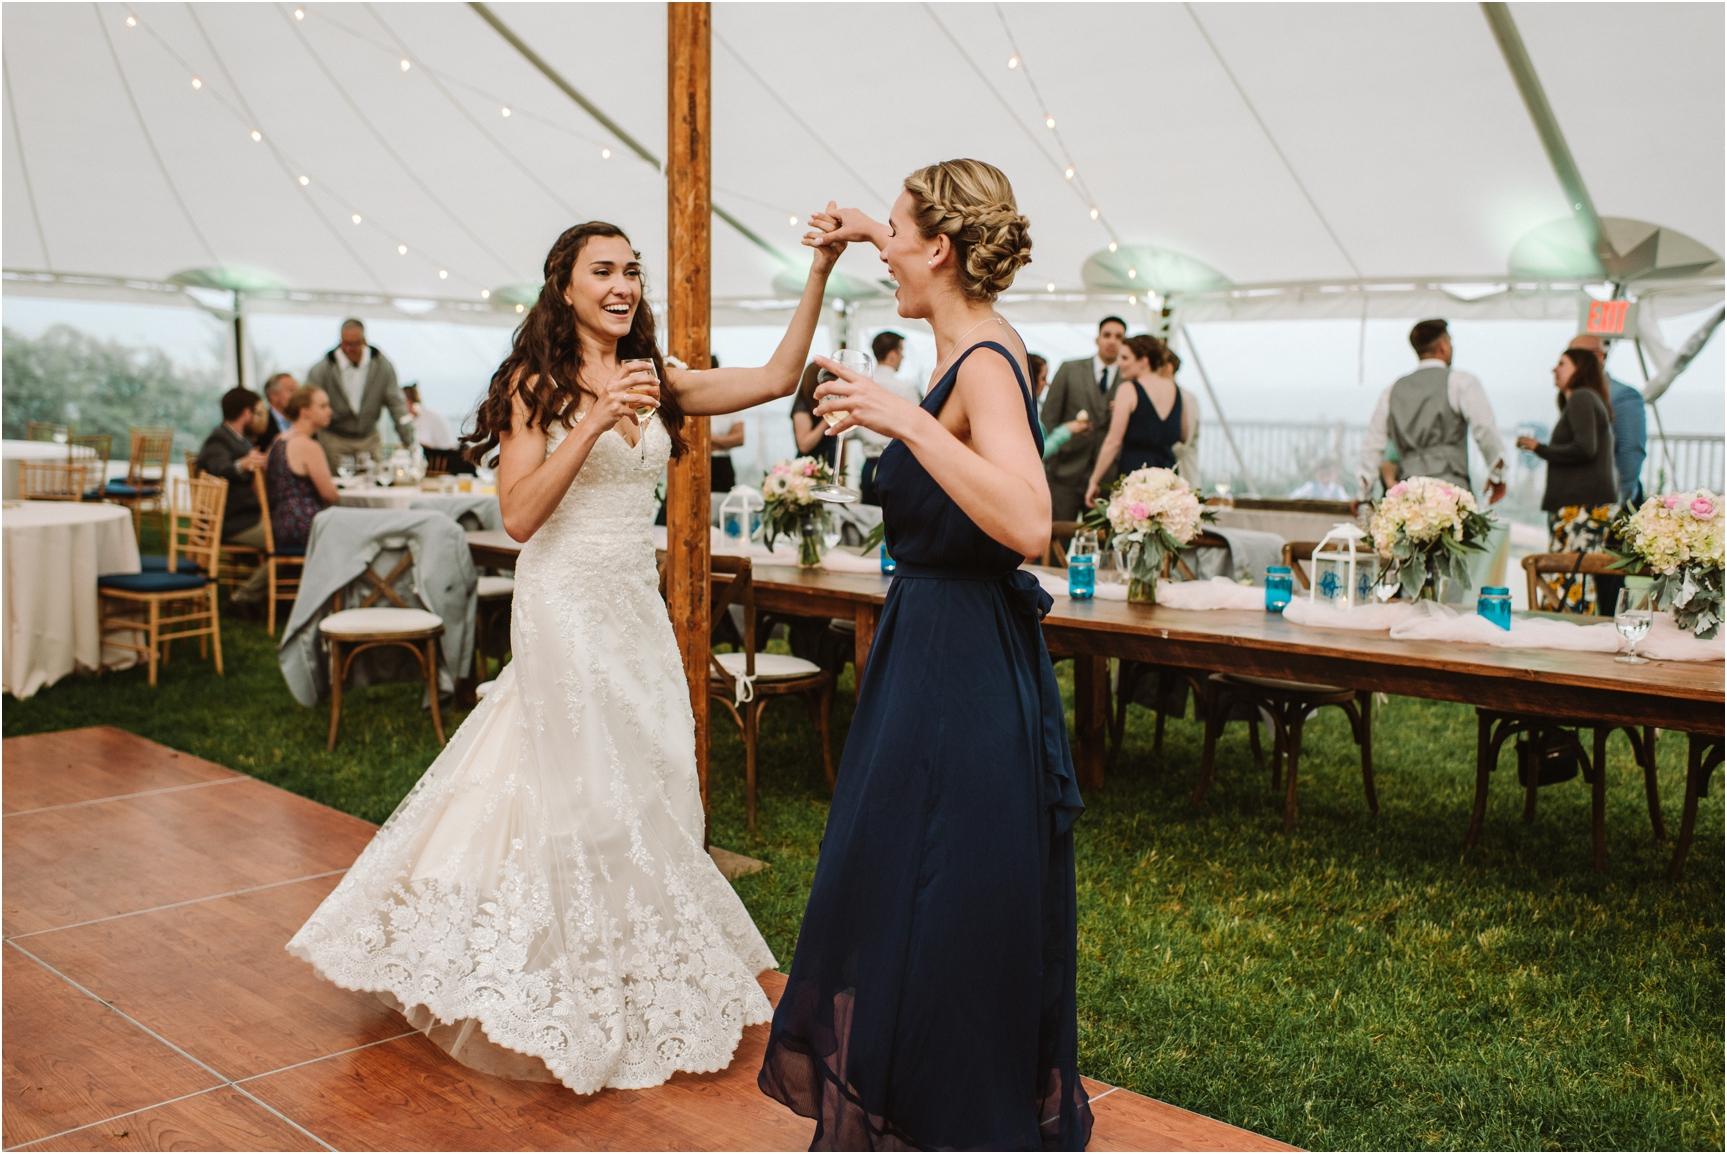 Sarah & Sam Pelham House Cape Cod Wedding Photographer-237.jpg